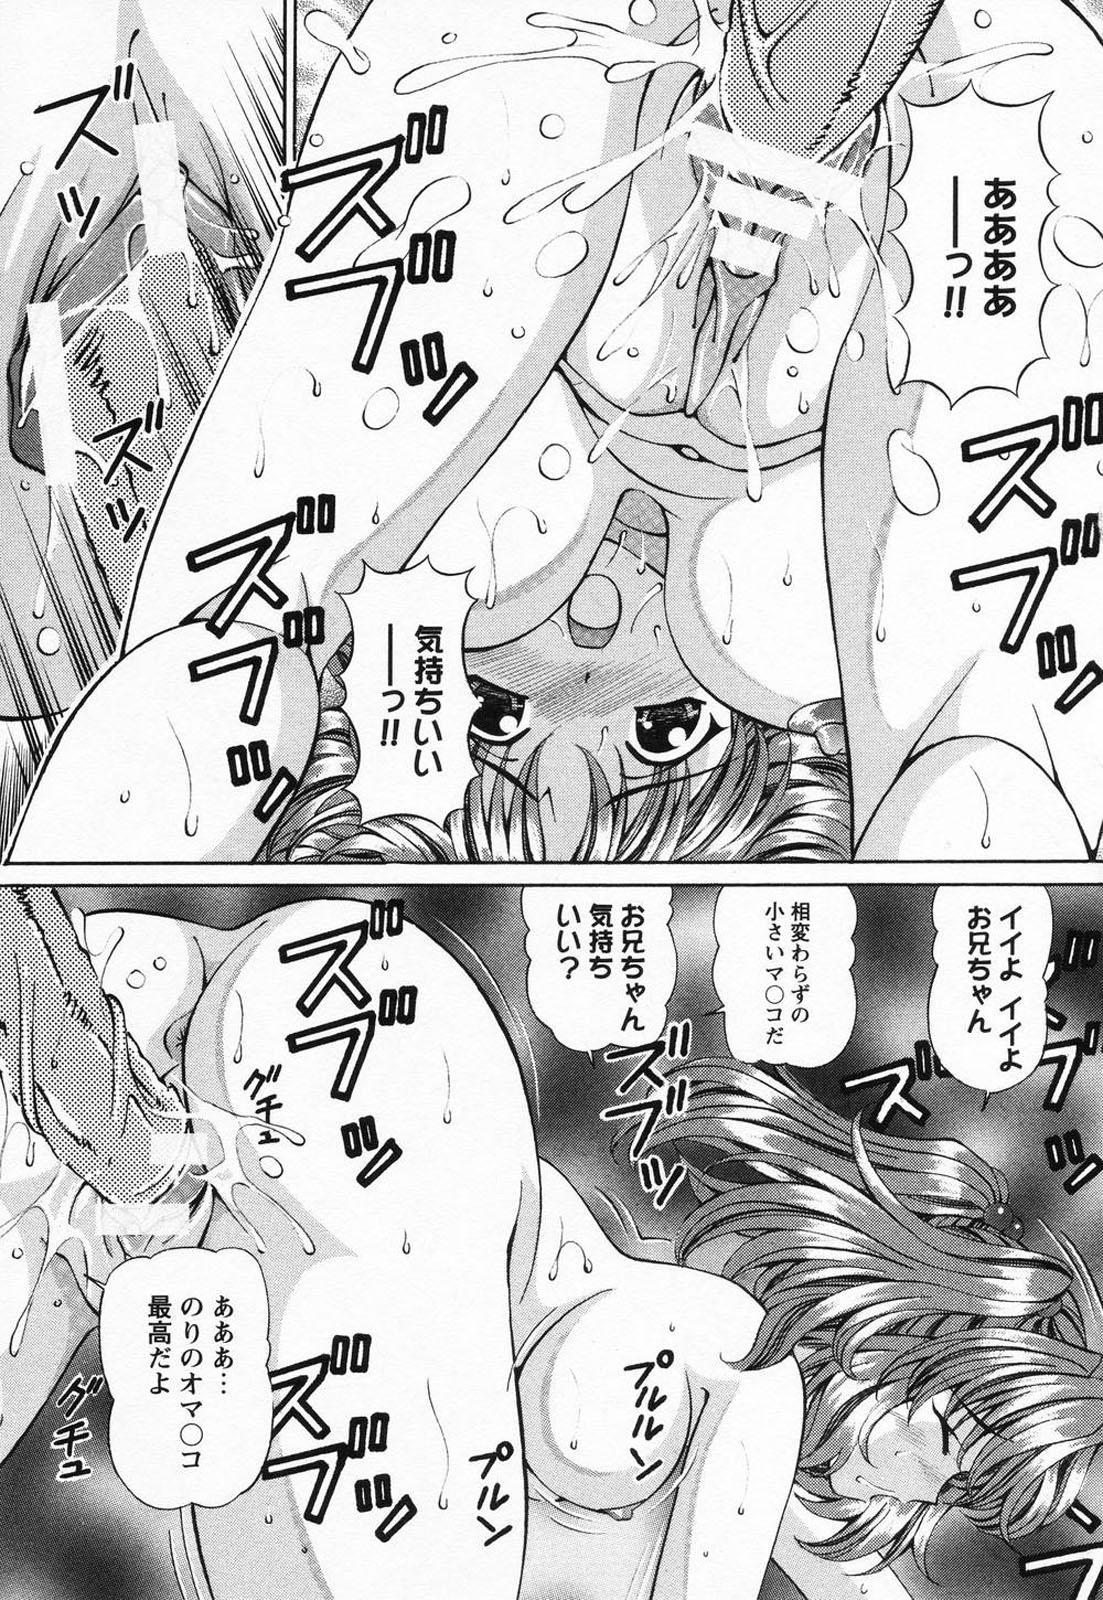 Jusei Muyou! 99